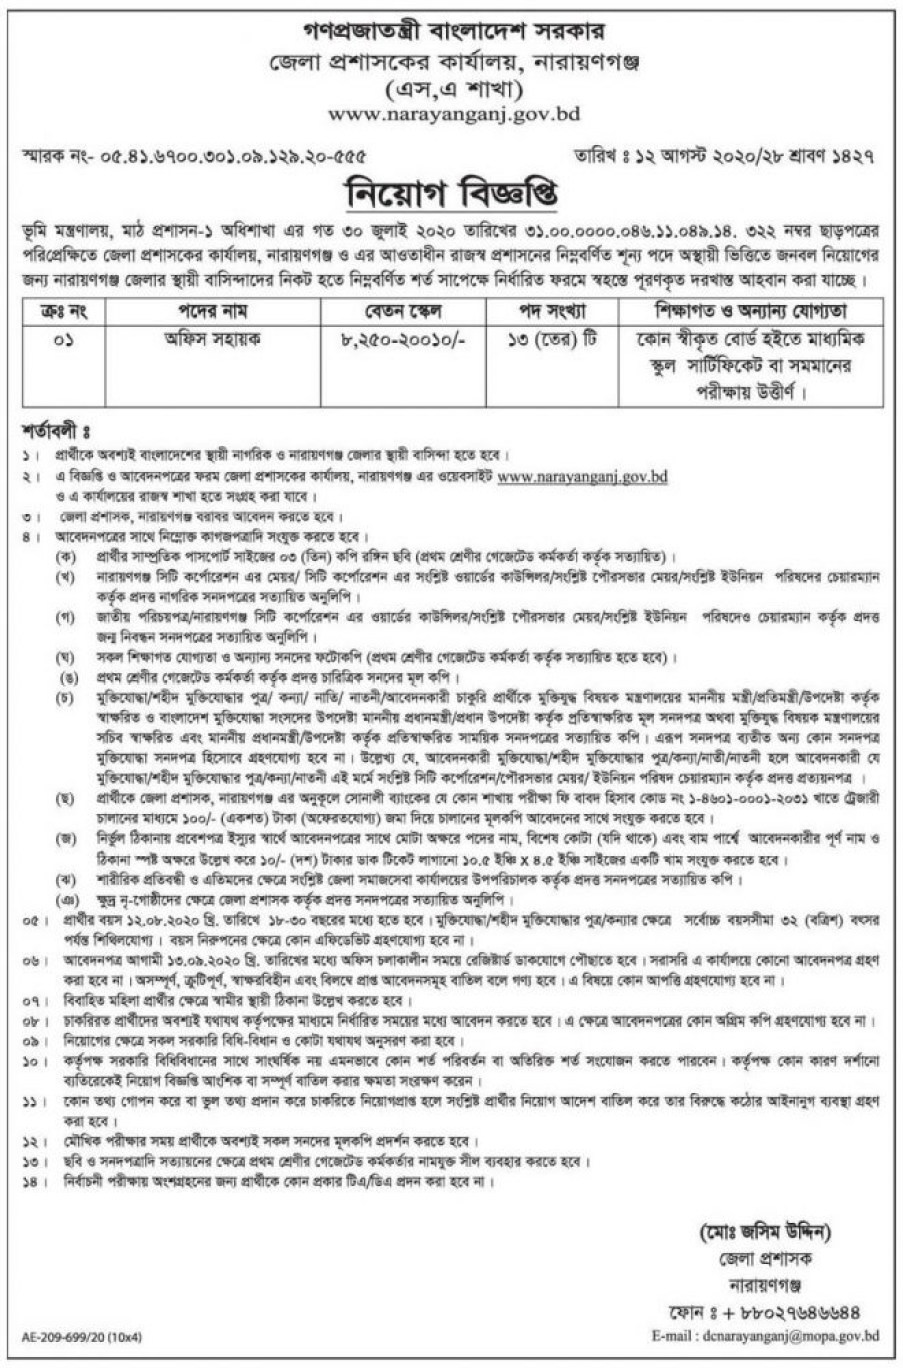 district-commissioner-office-job-circular-2020